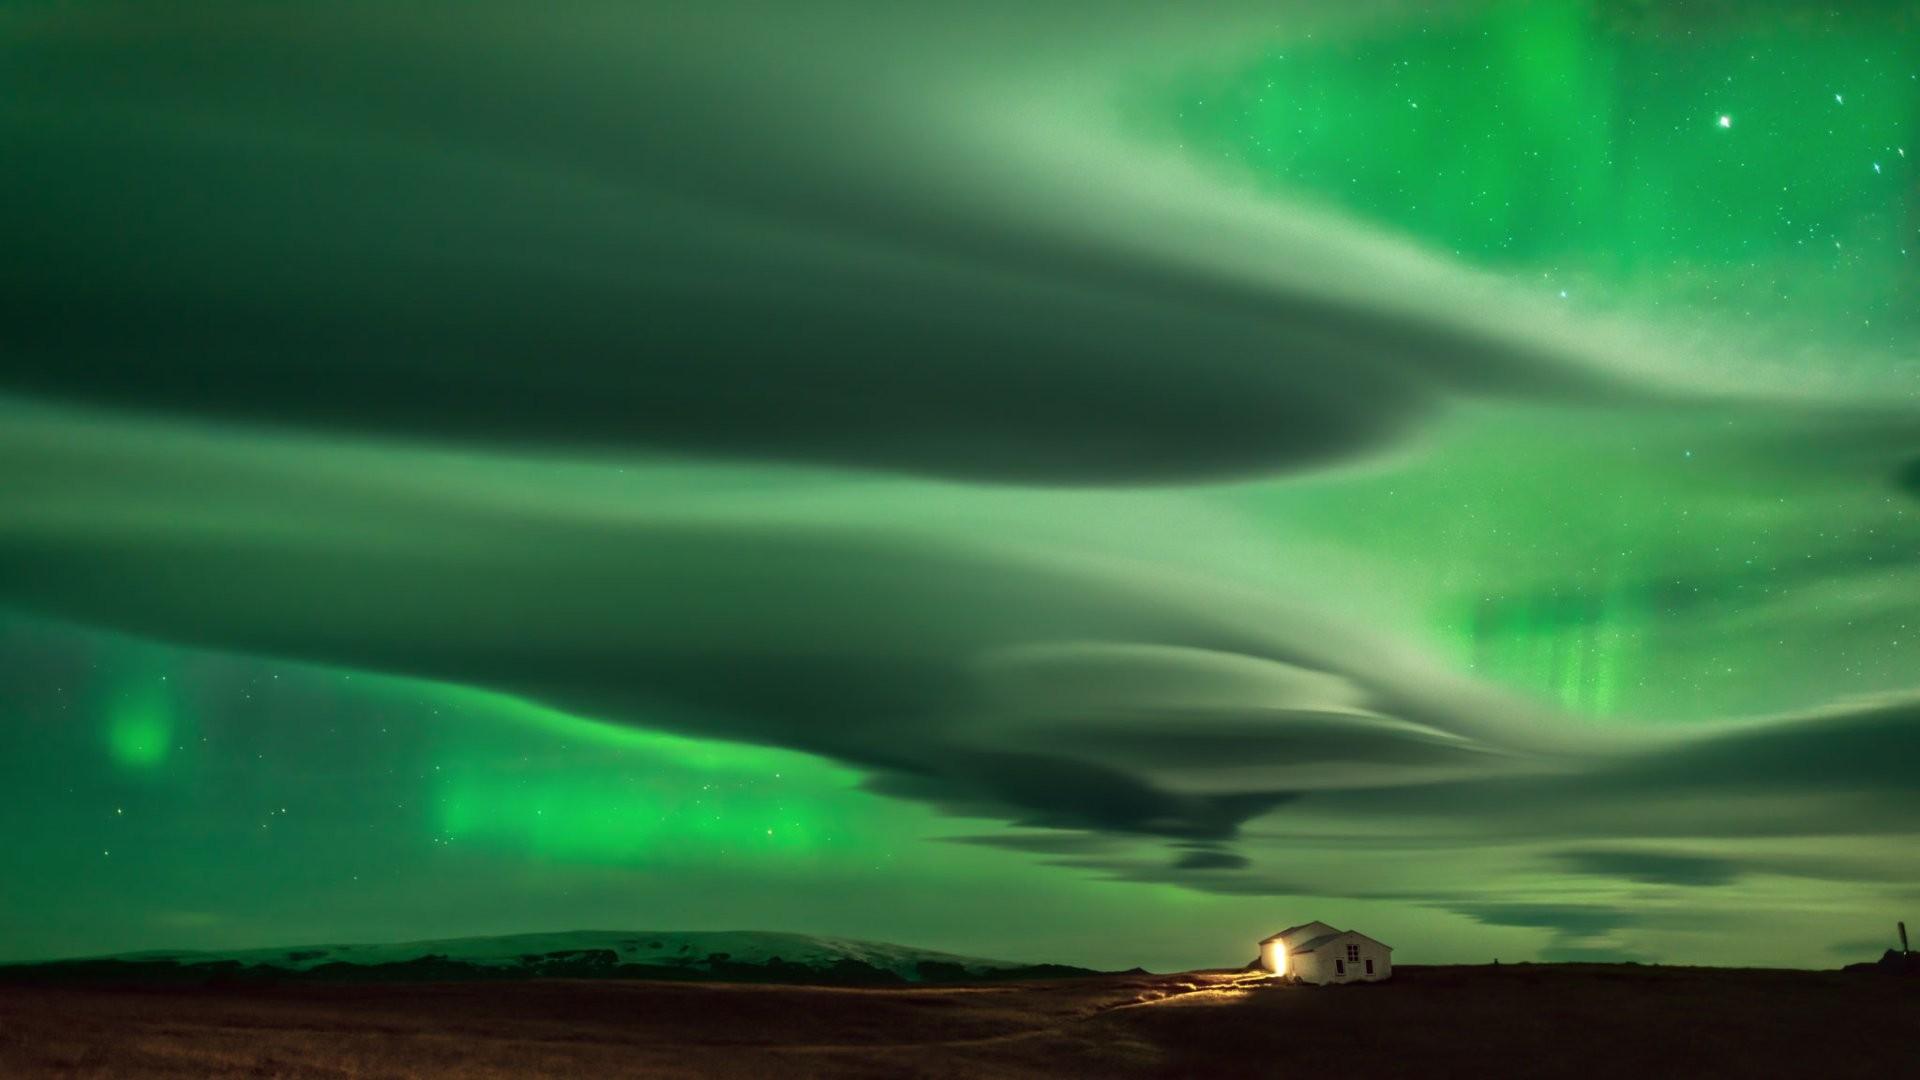 Sfondi Galassia Pianeta Nasa Cielo Stelle Verde Nebulosa